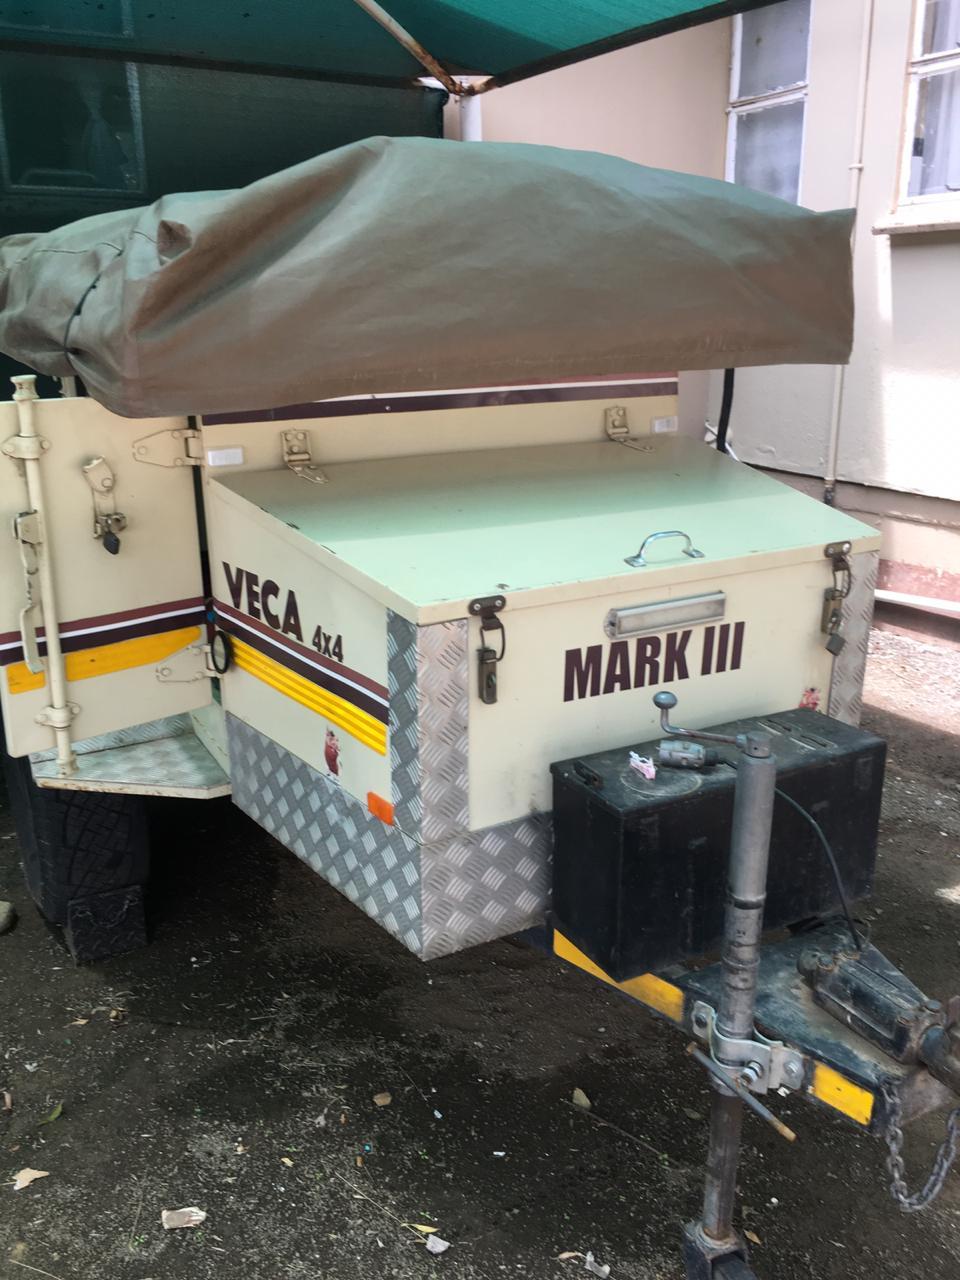 VECA 4X4 MARK III CAMPER TRAILER